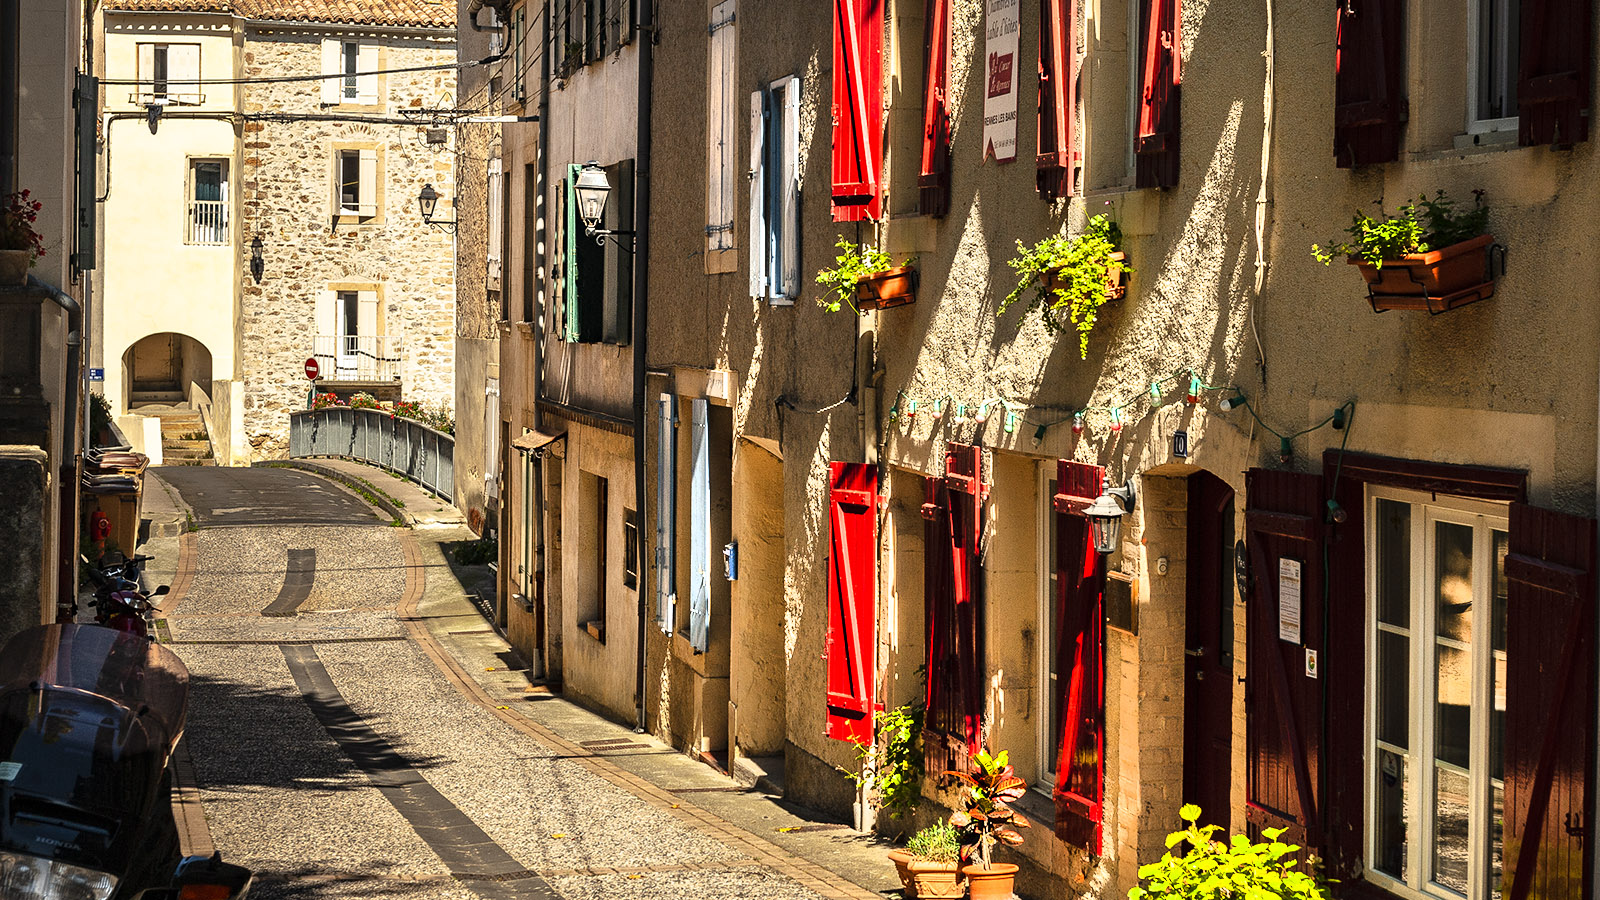 Rennes-les-Bains: Fassaden im alten Ortskern. Foto: Hilke Maunder